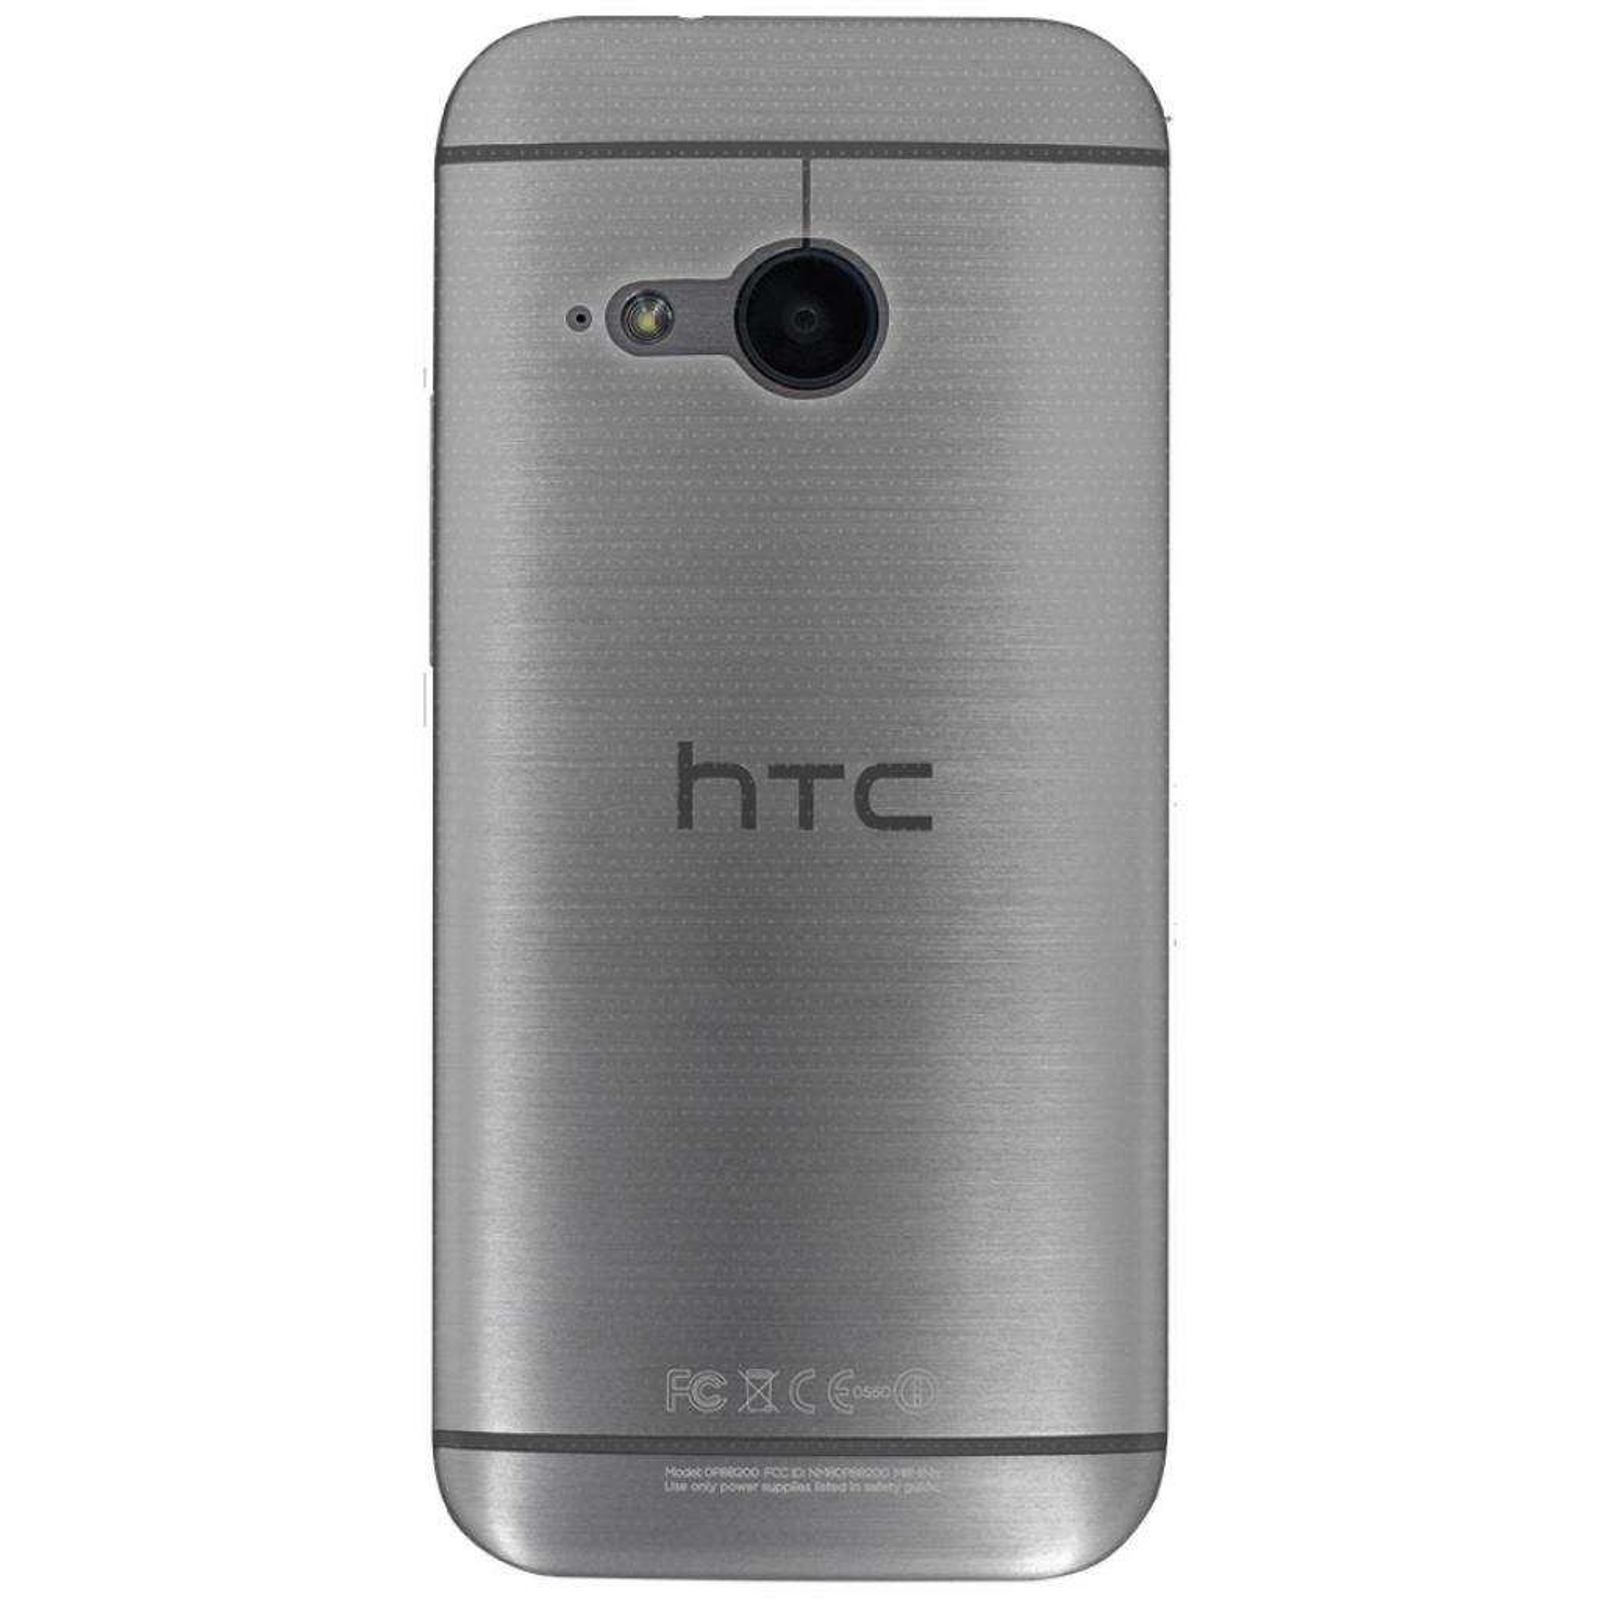 Чехол для моб. телефона GLOBAL для HTC One Mini 2 (светлый) (1283126460869)